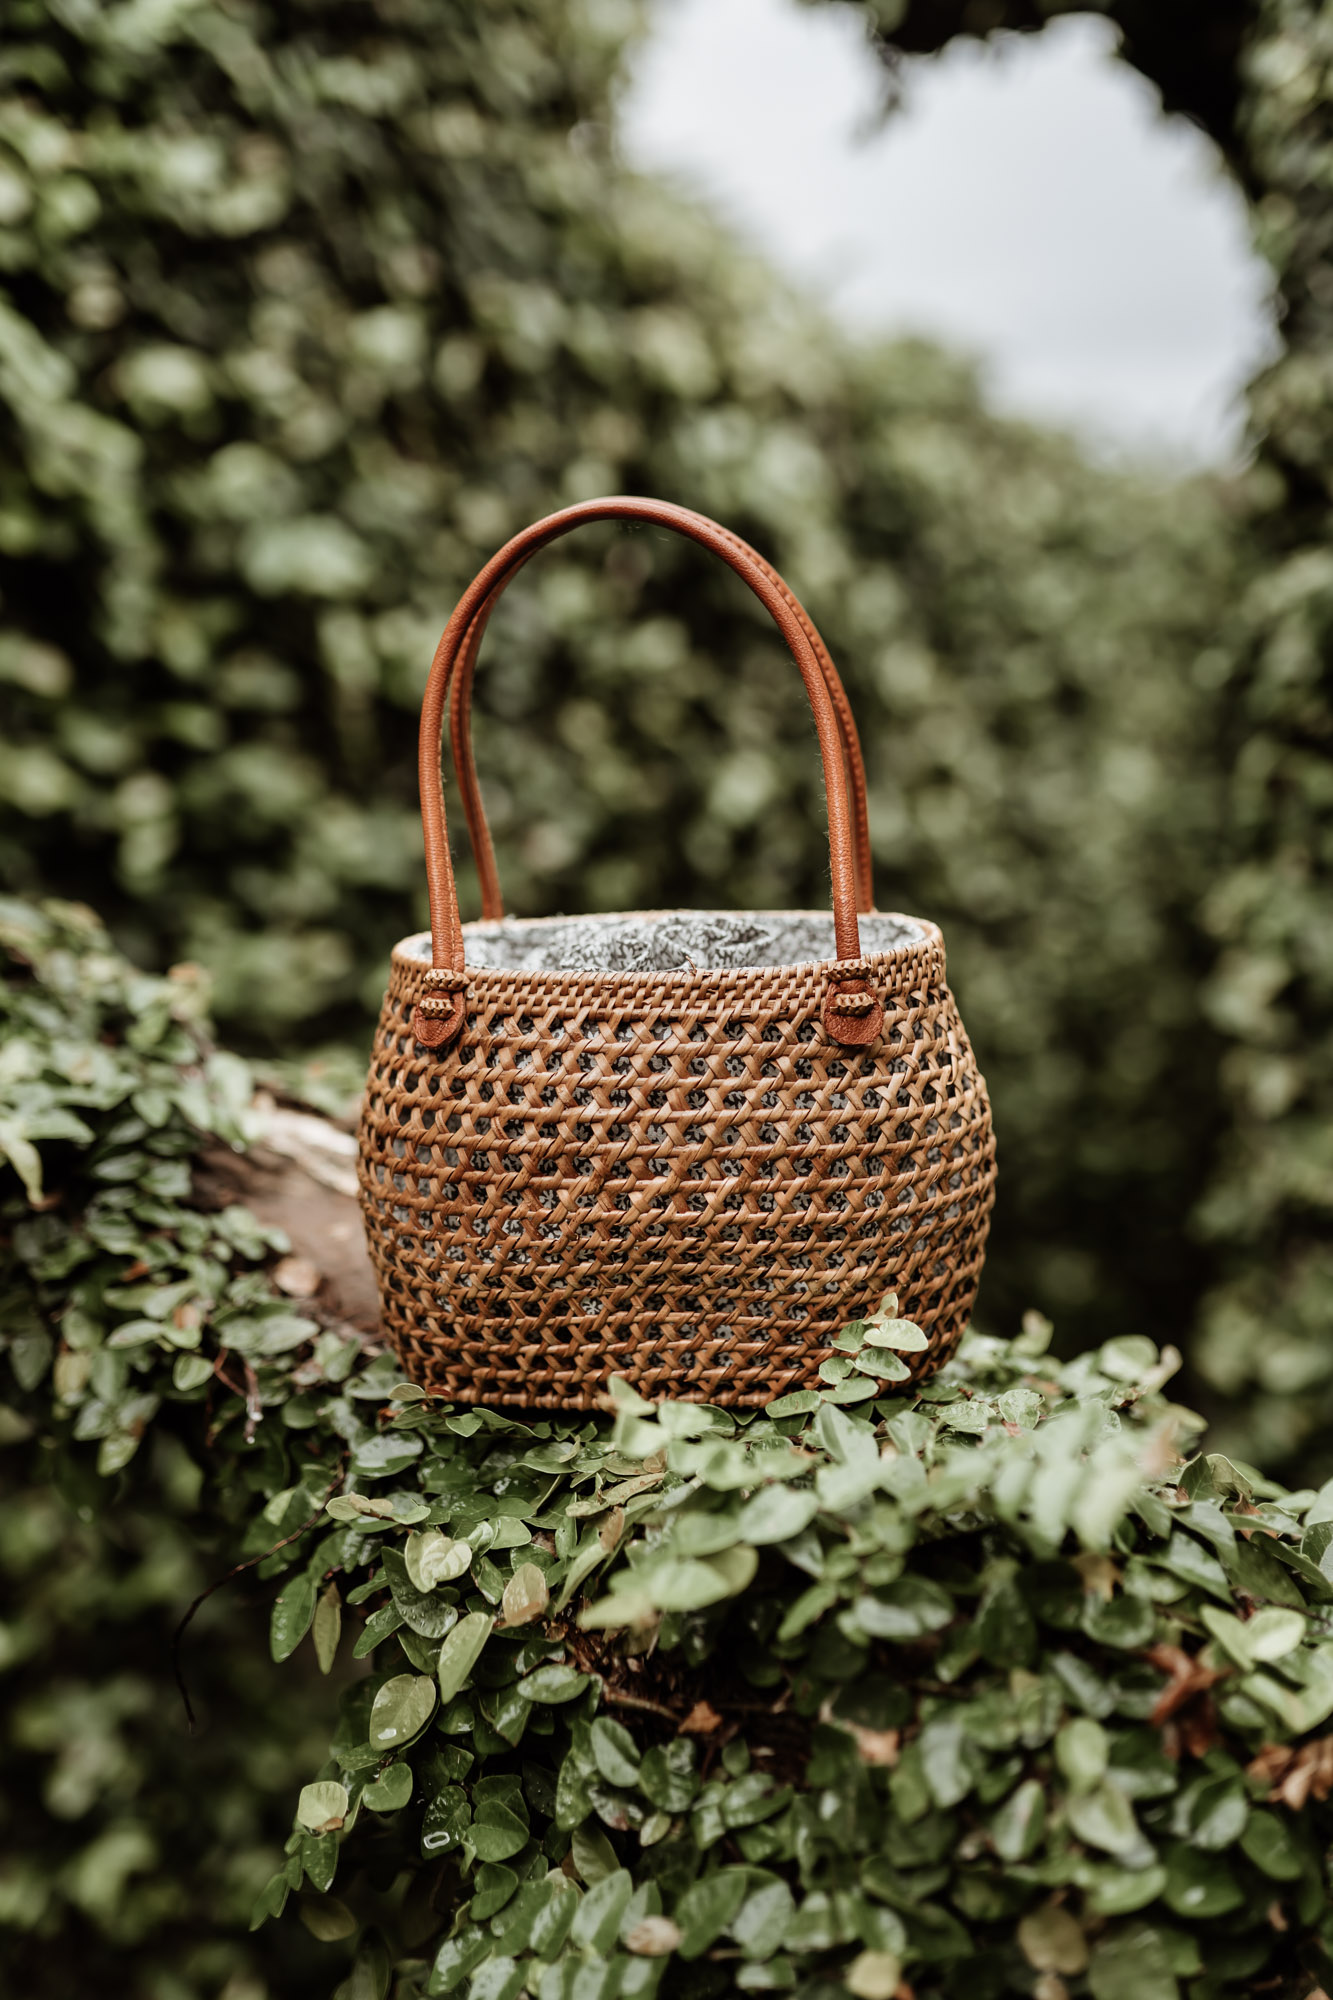 keira-mason-31-bits-bag-in-garden.jpg